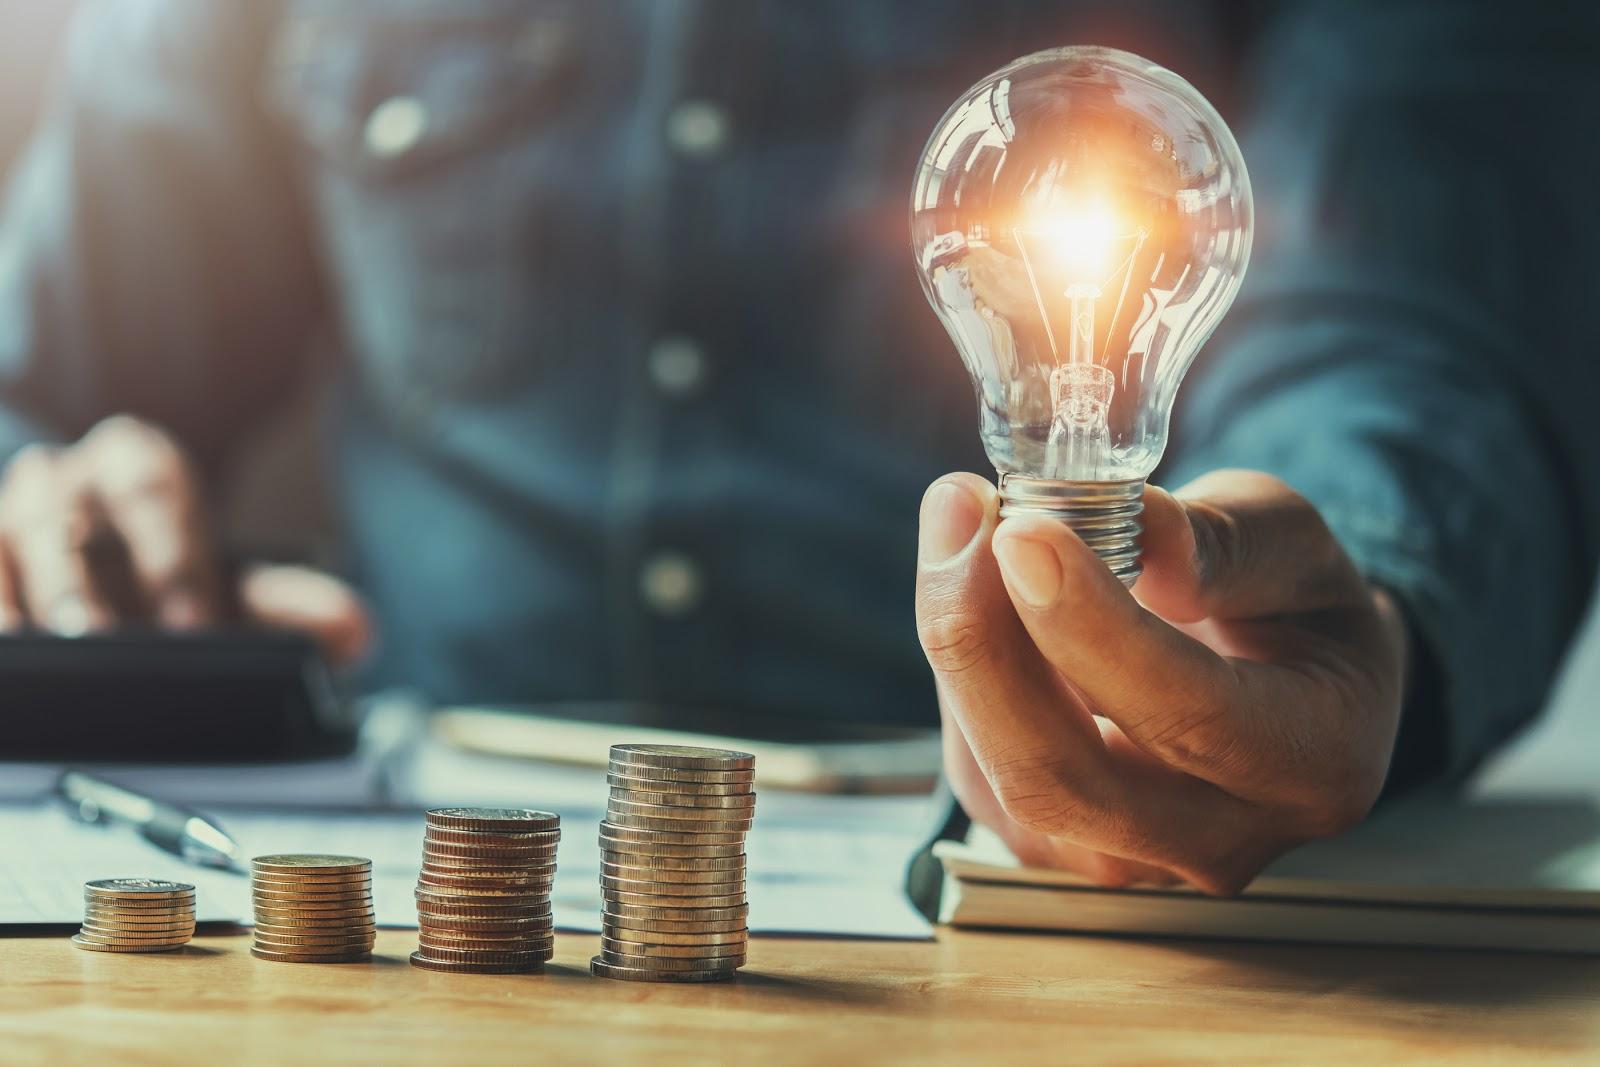 energy-saving-tips-coins-main-lightbulb